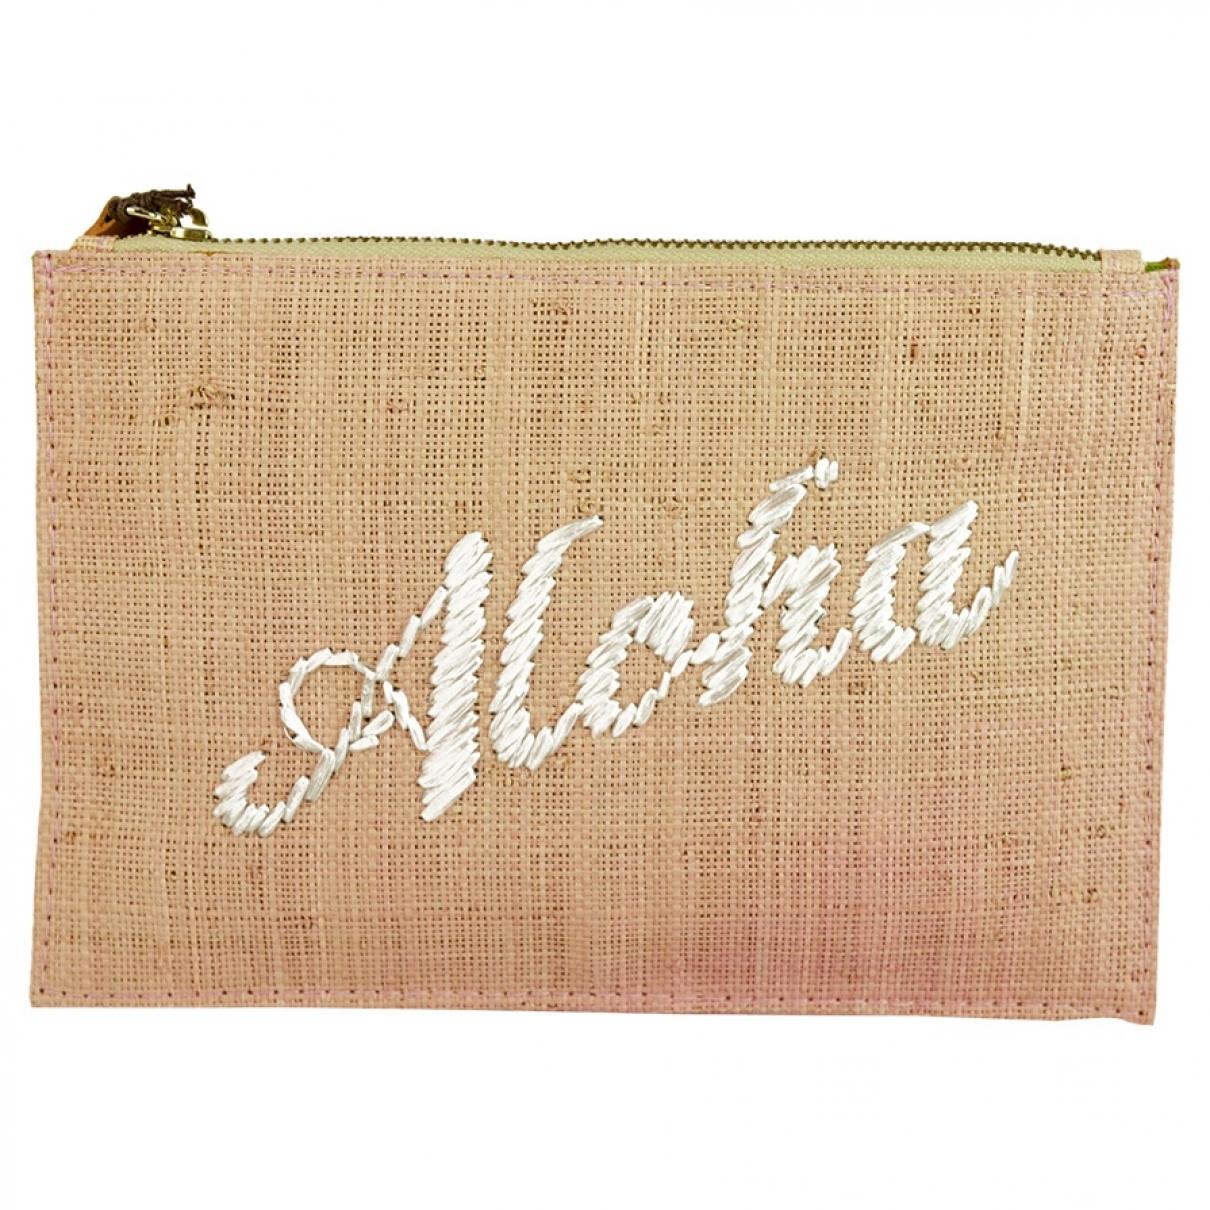 Kayu \N Pink Wicker Clutch bag for Women \N